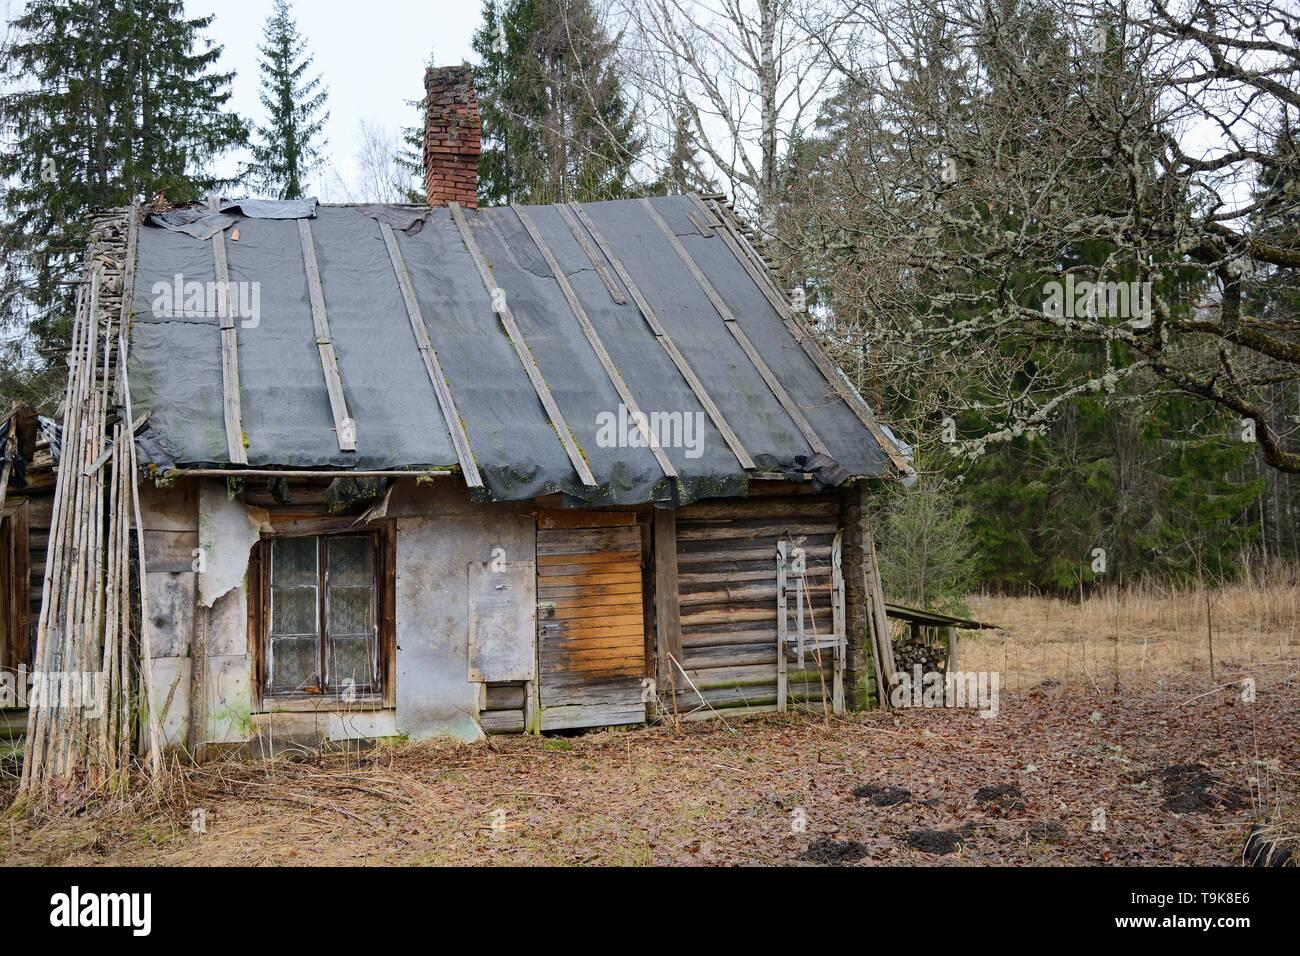 Derelict, abandoned cottage, Muraka Forest, Estonia, April 2018. - Stock Image